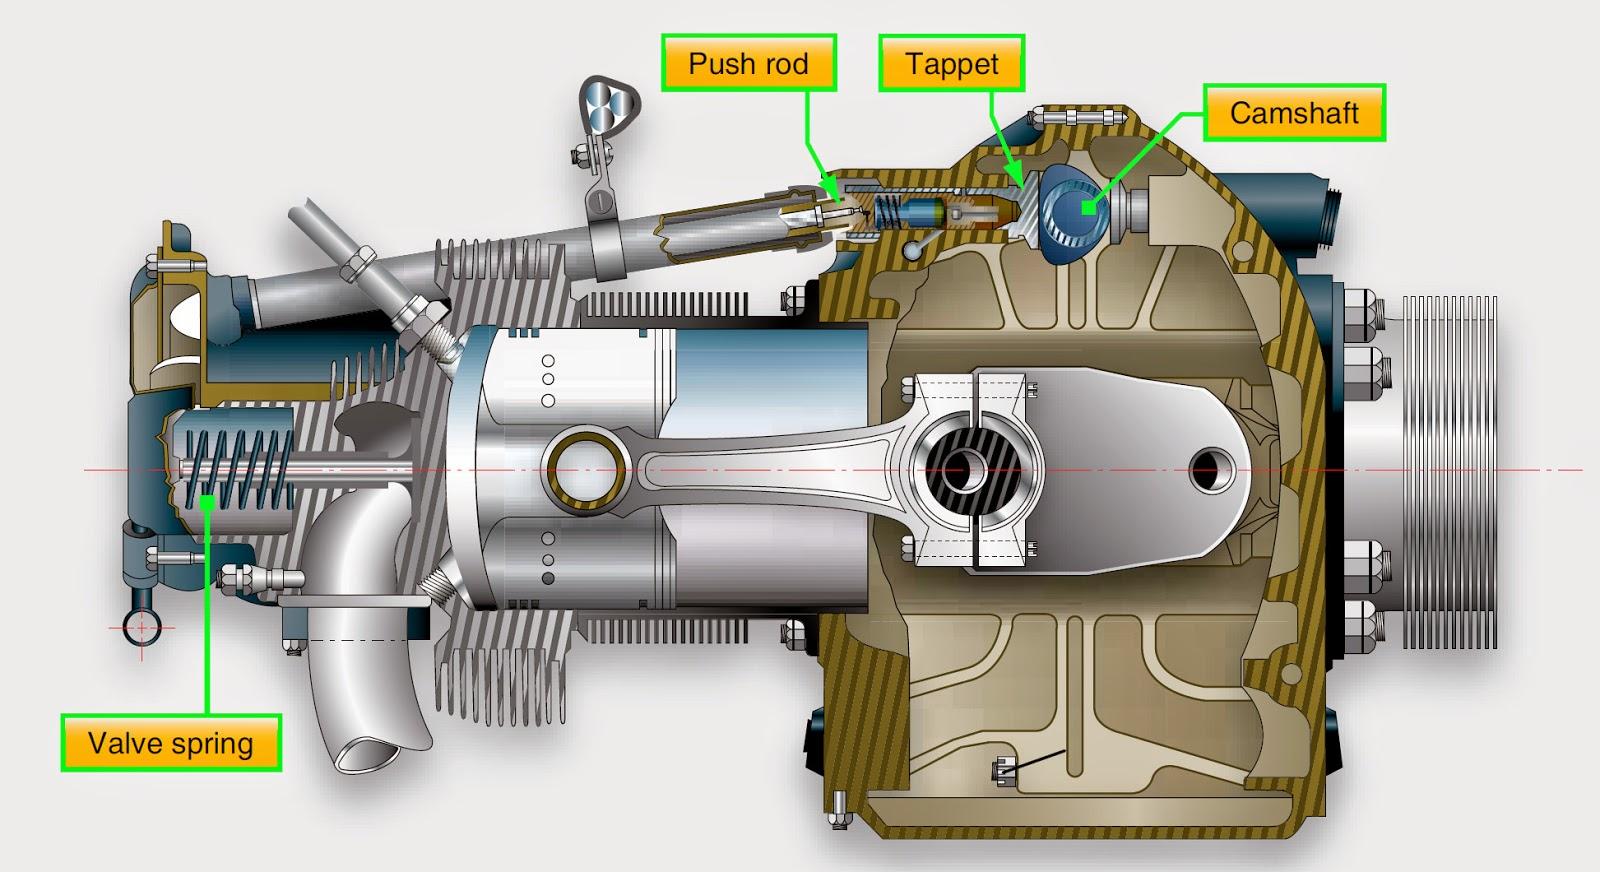 aircraft systems valve operating mechanism rh okigihan blogspot com Reciprocating Pump Engine Diagram Natural Gas Reciprocating Engine Diagram